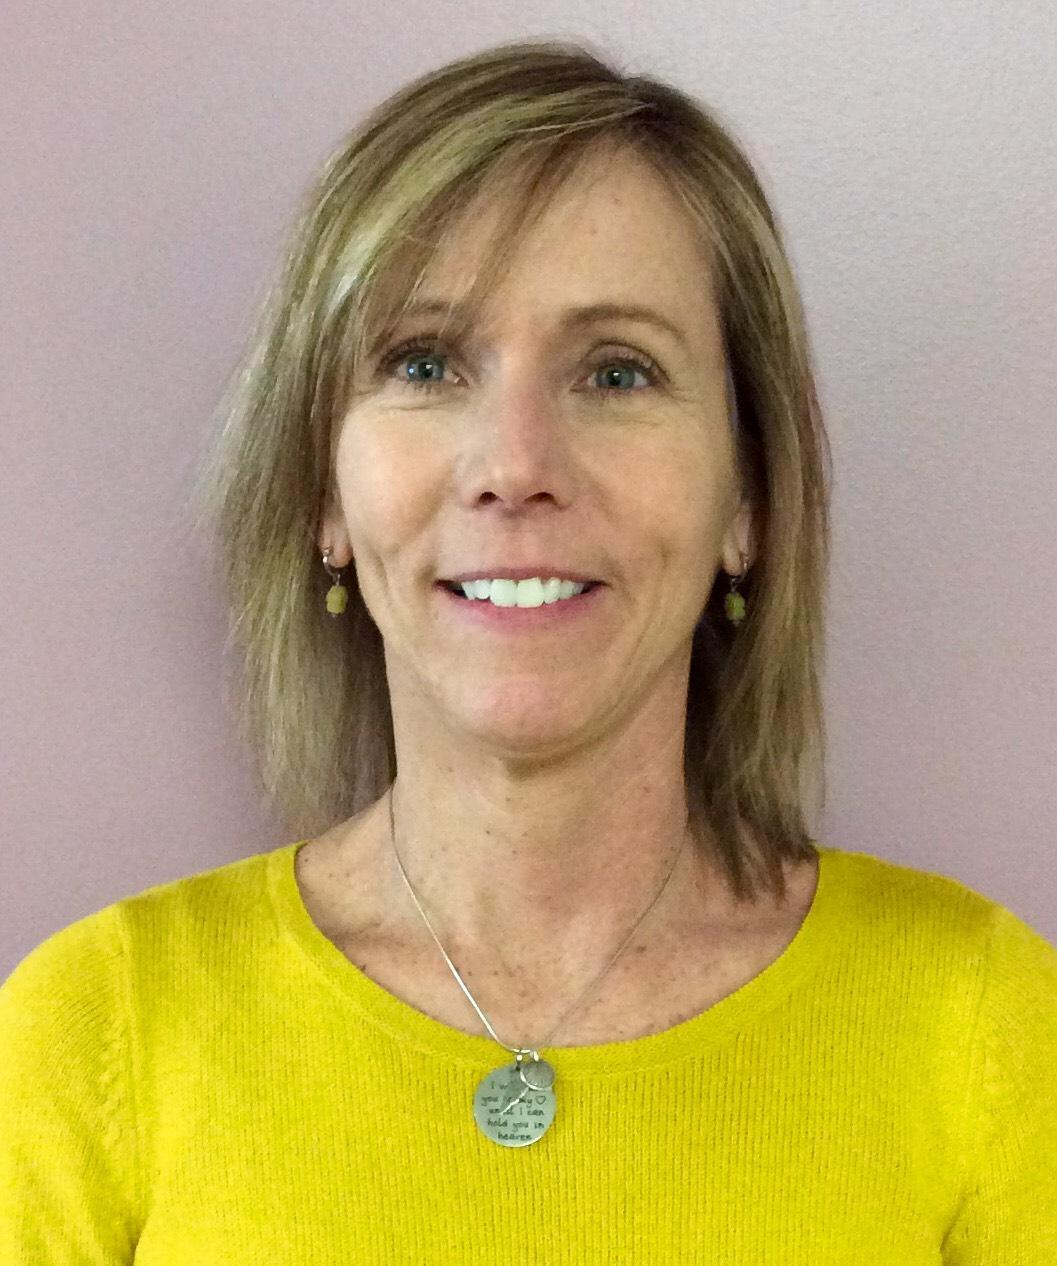 Jennifer Becker, Program Assistant